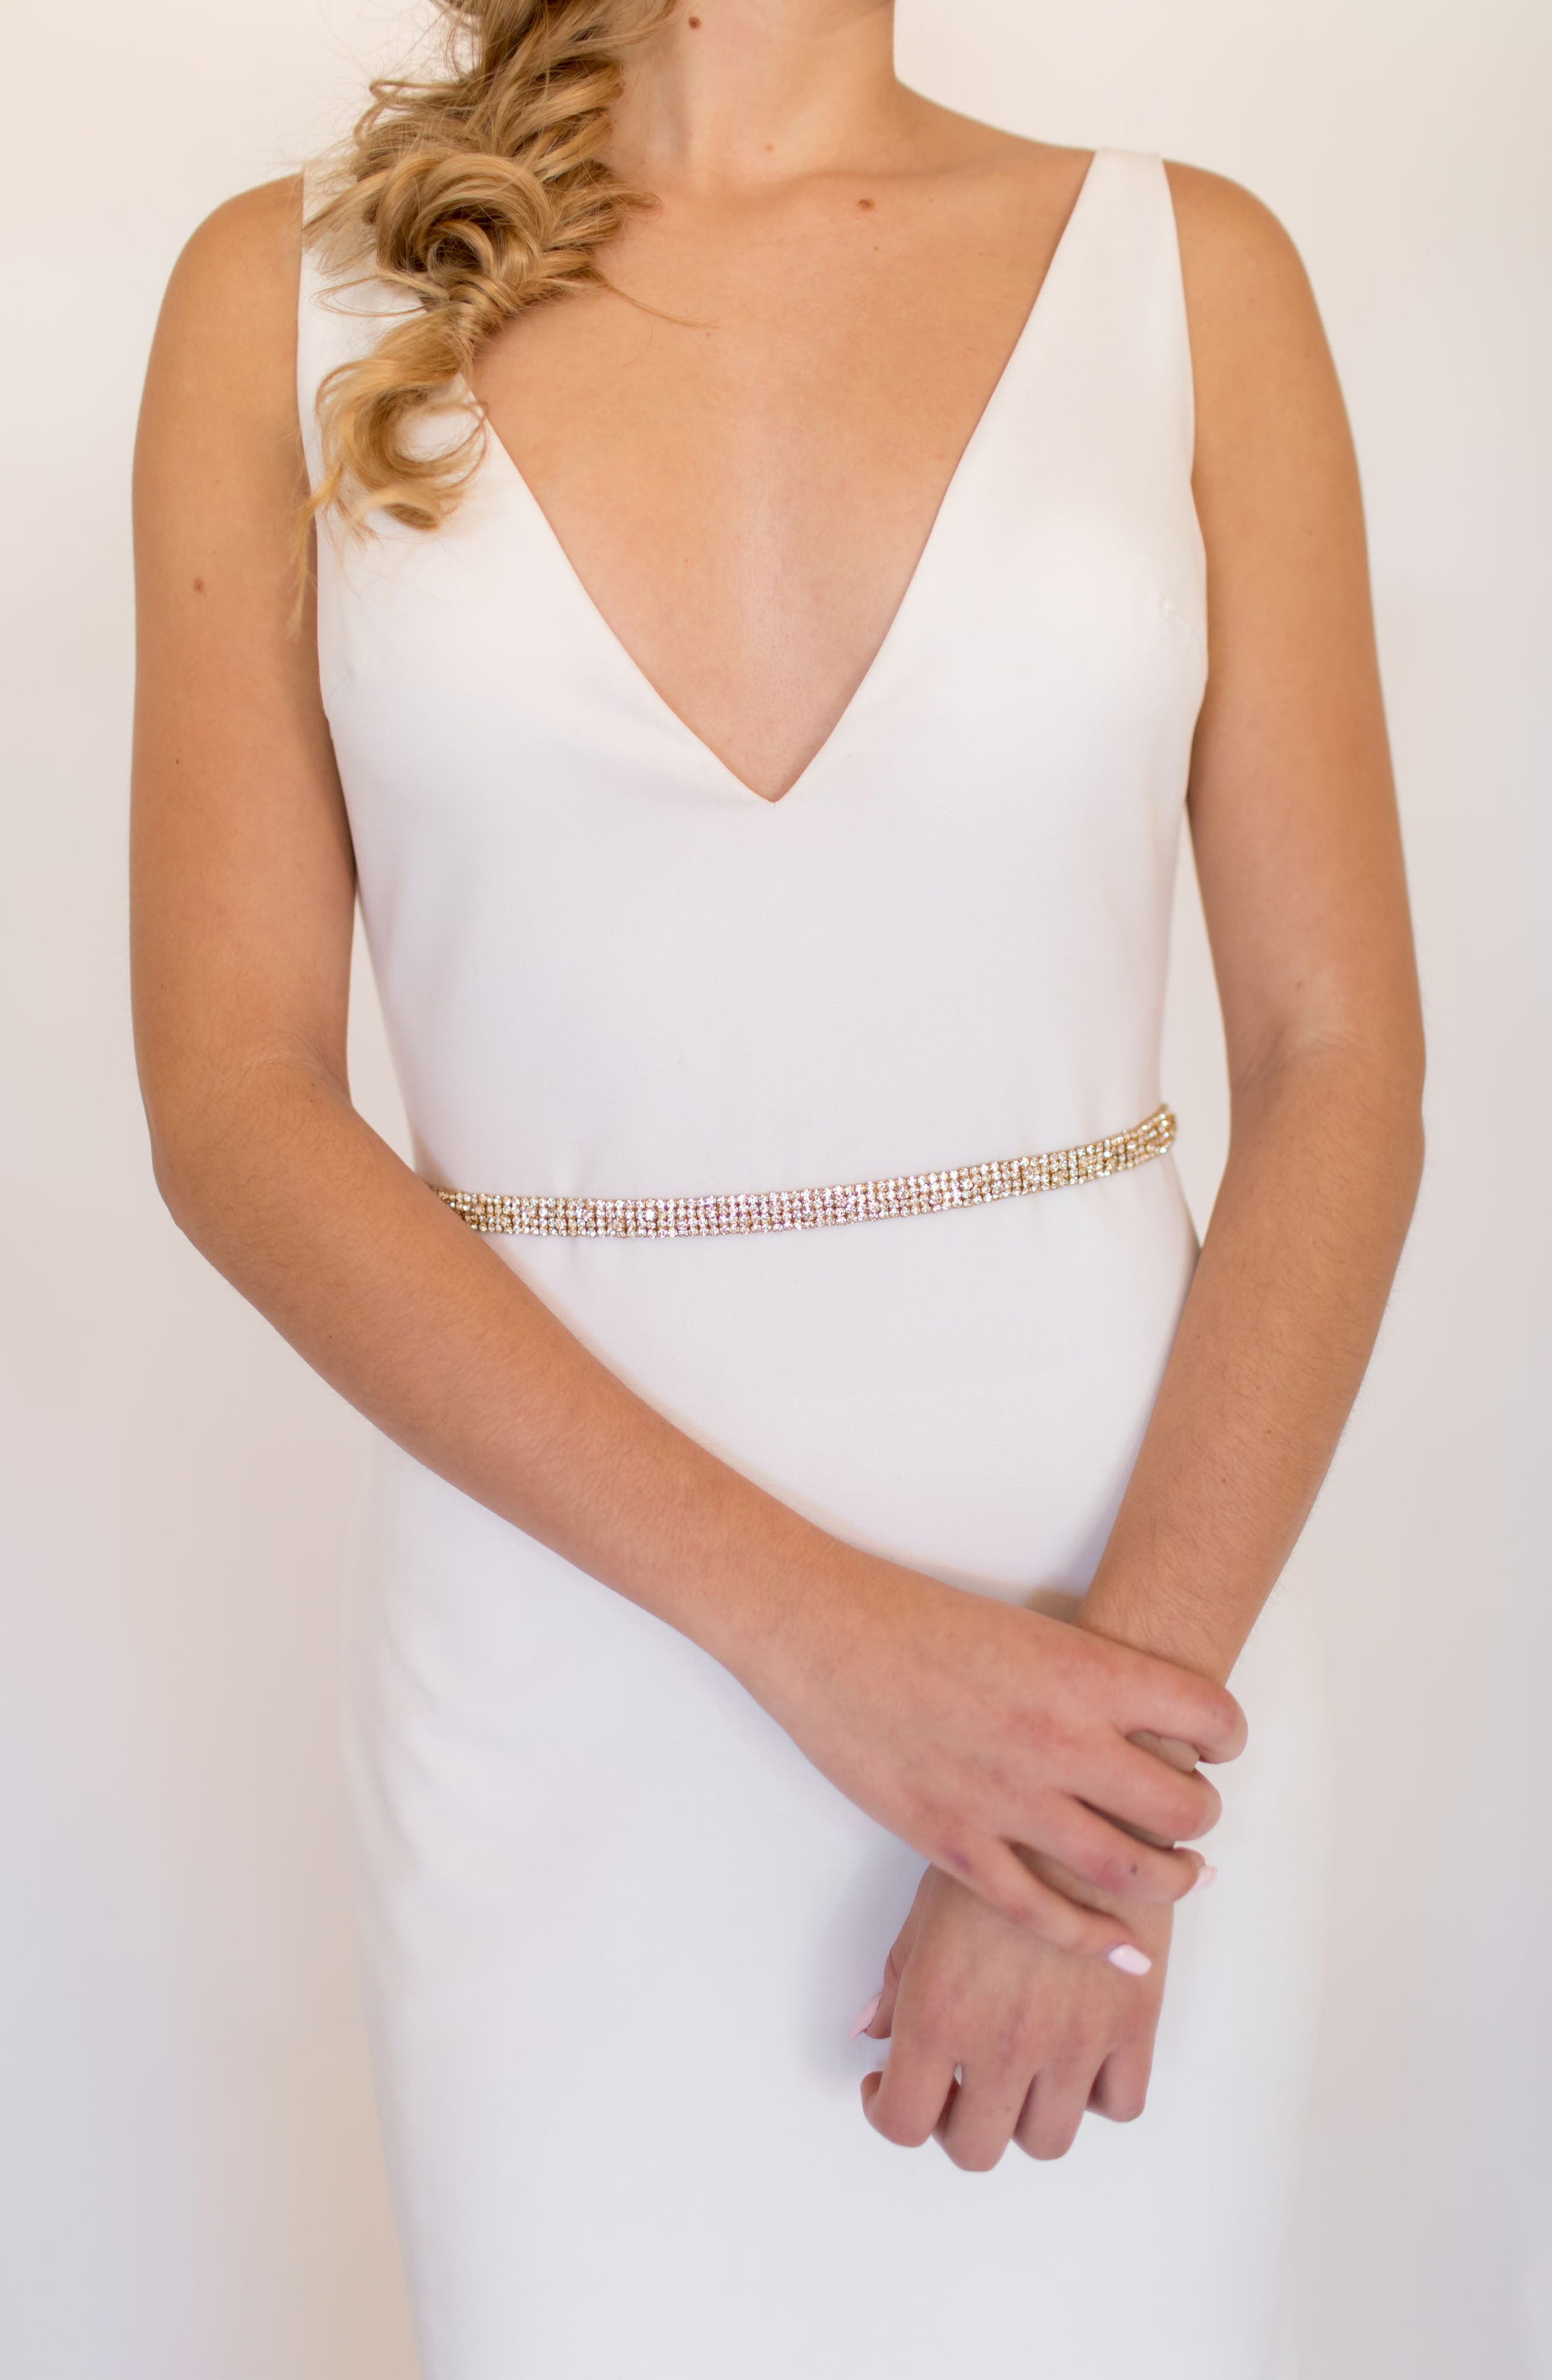 Untamed Petals By Amanda Judge June Crystal Belt, Size One Size - Gold